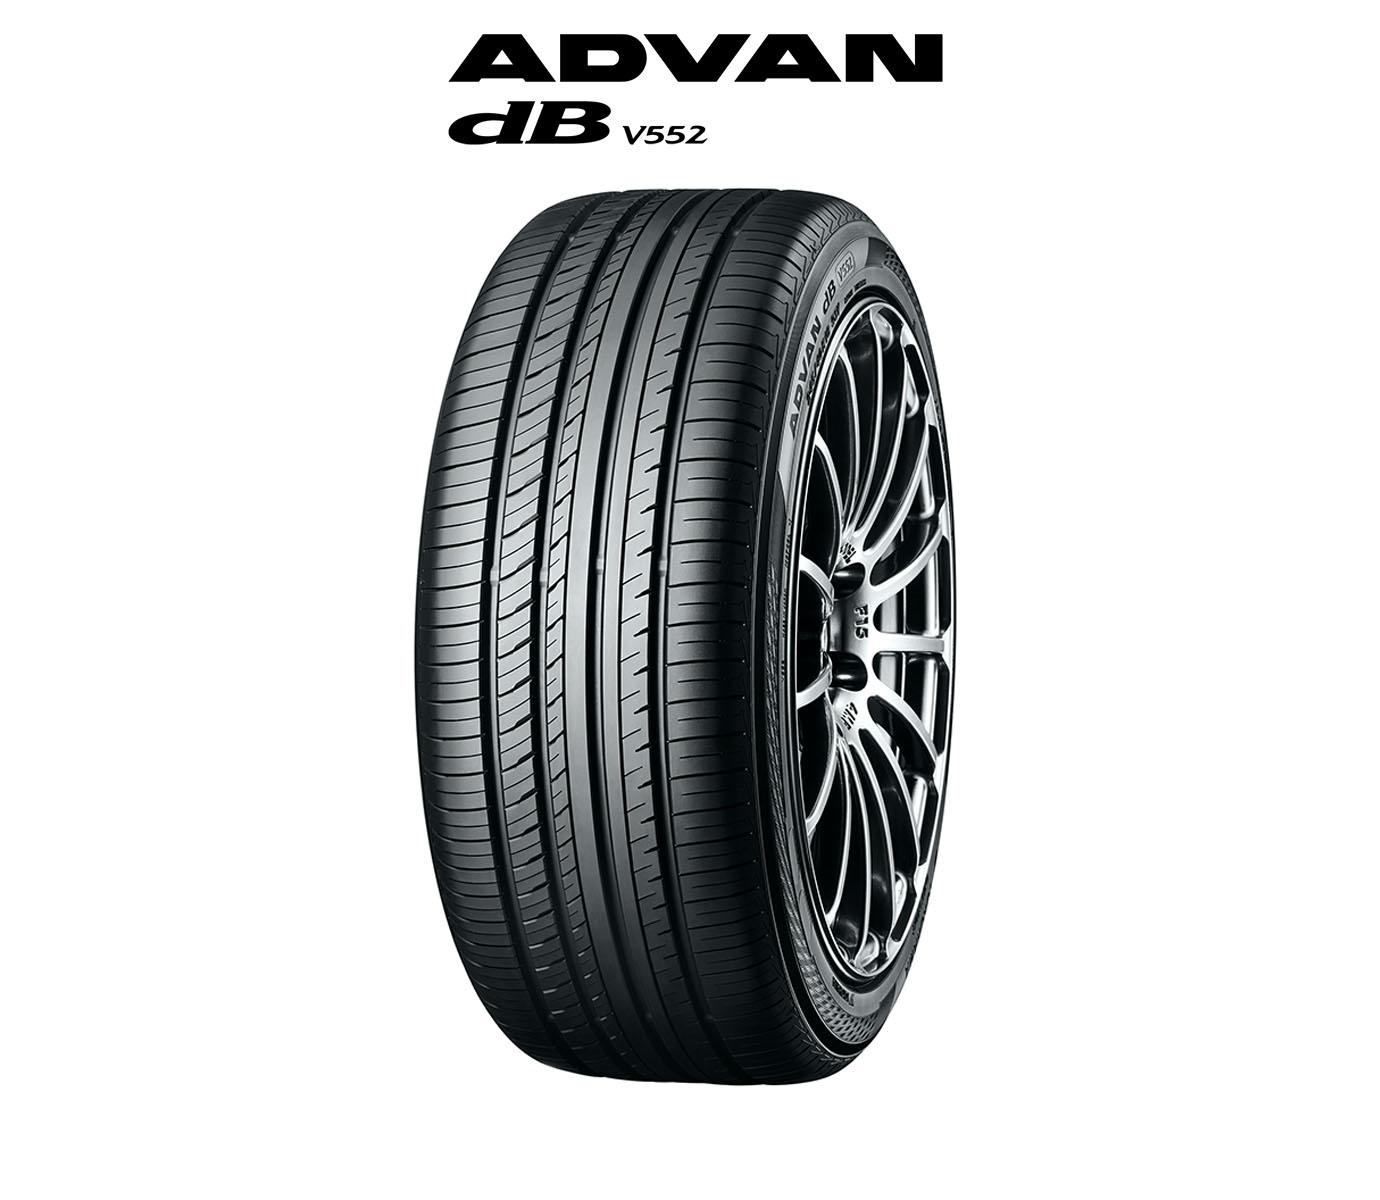 Silence and comfort with Yokohama's EV tyres